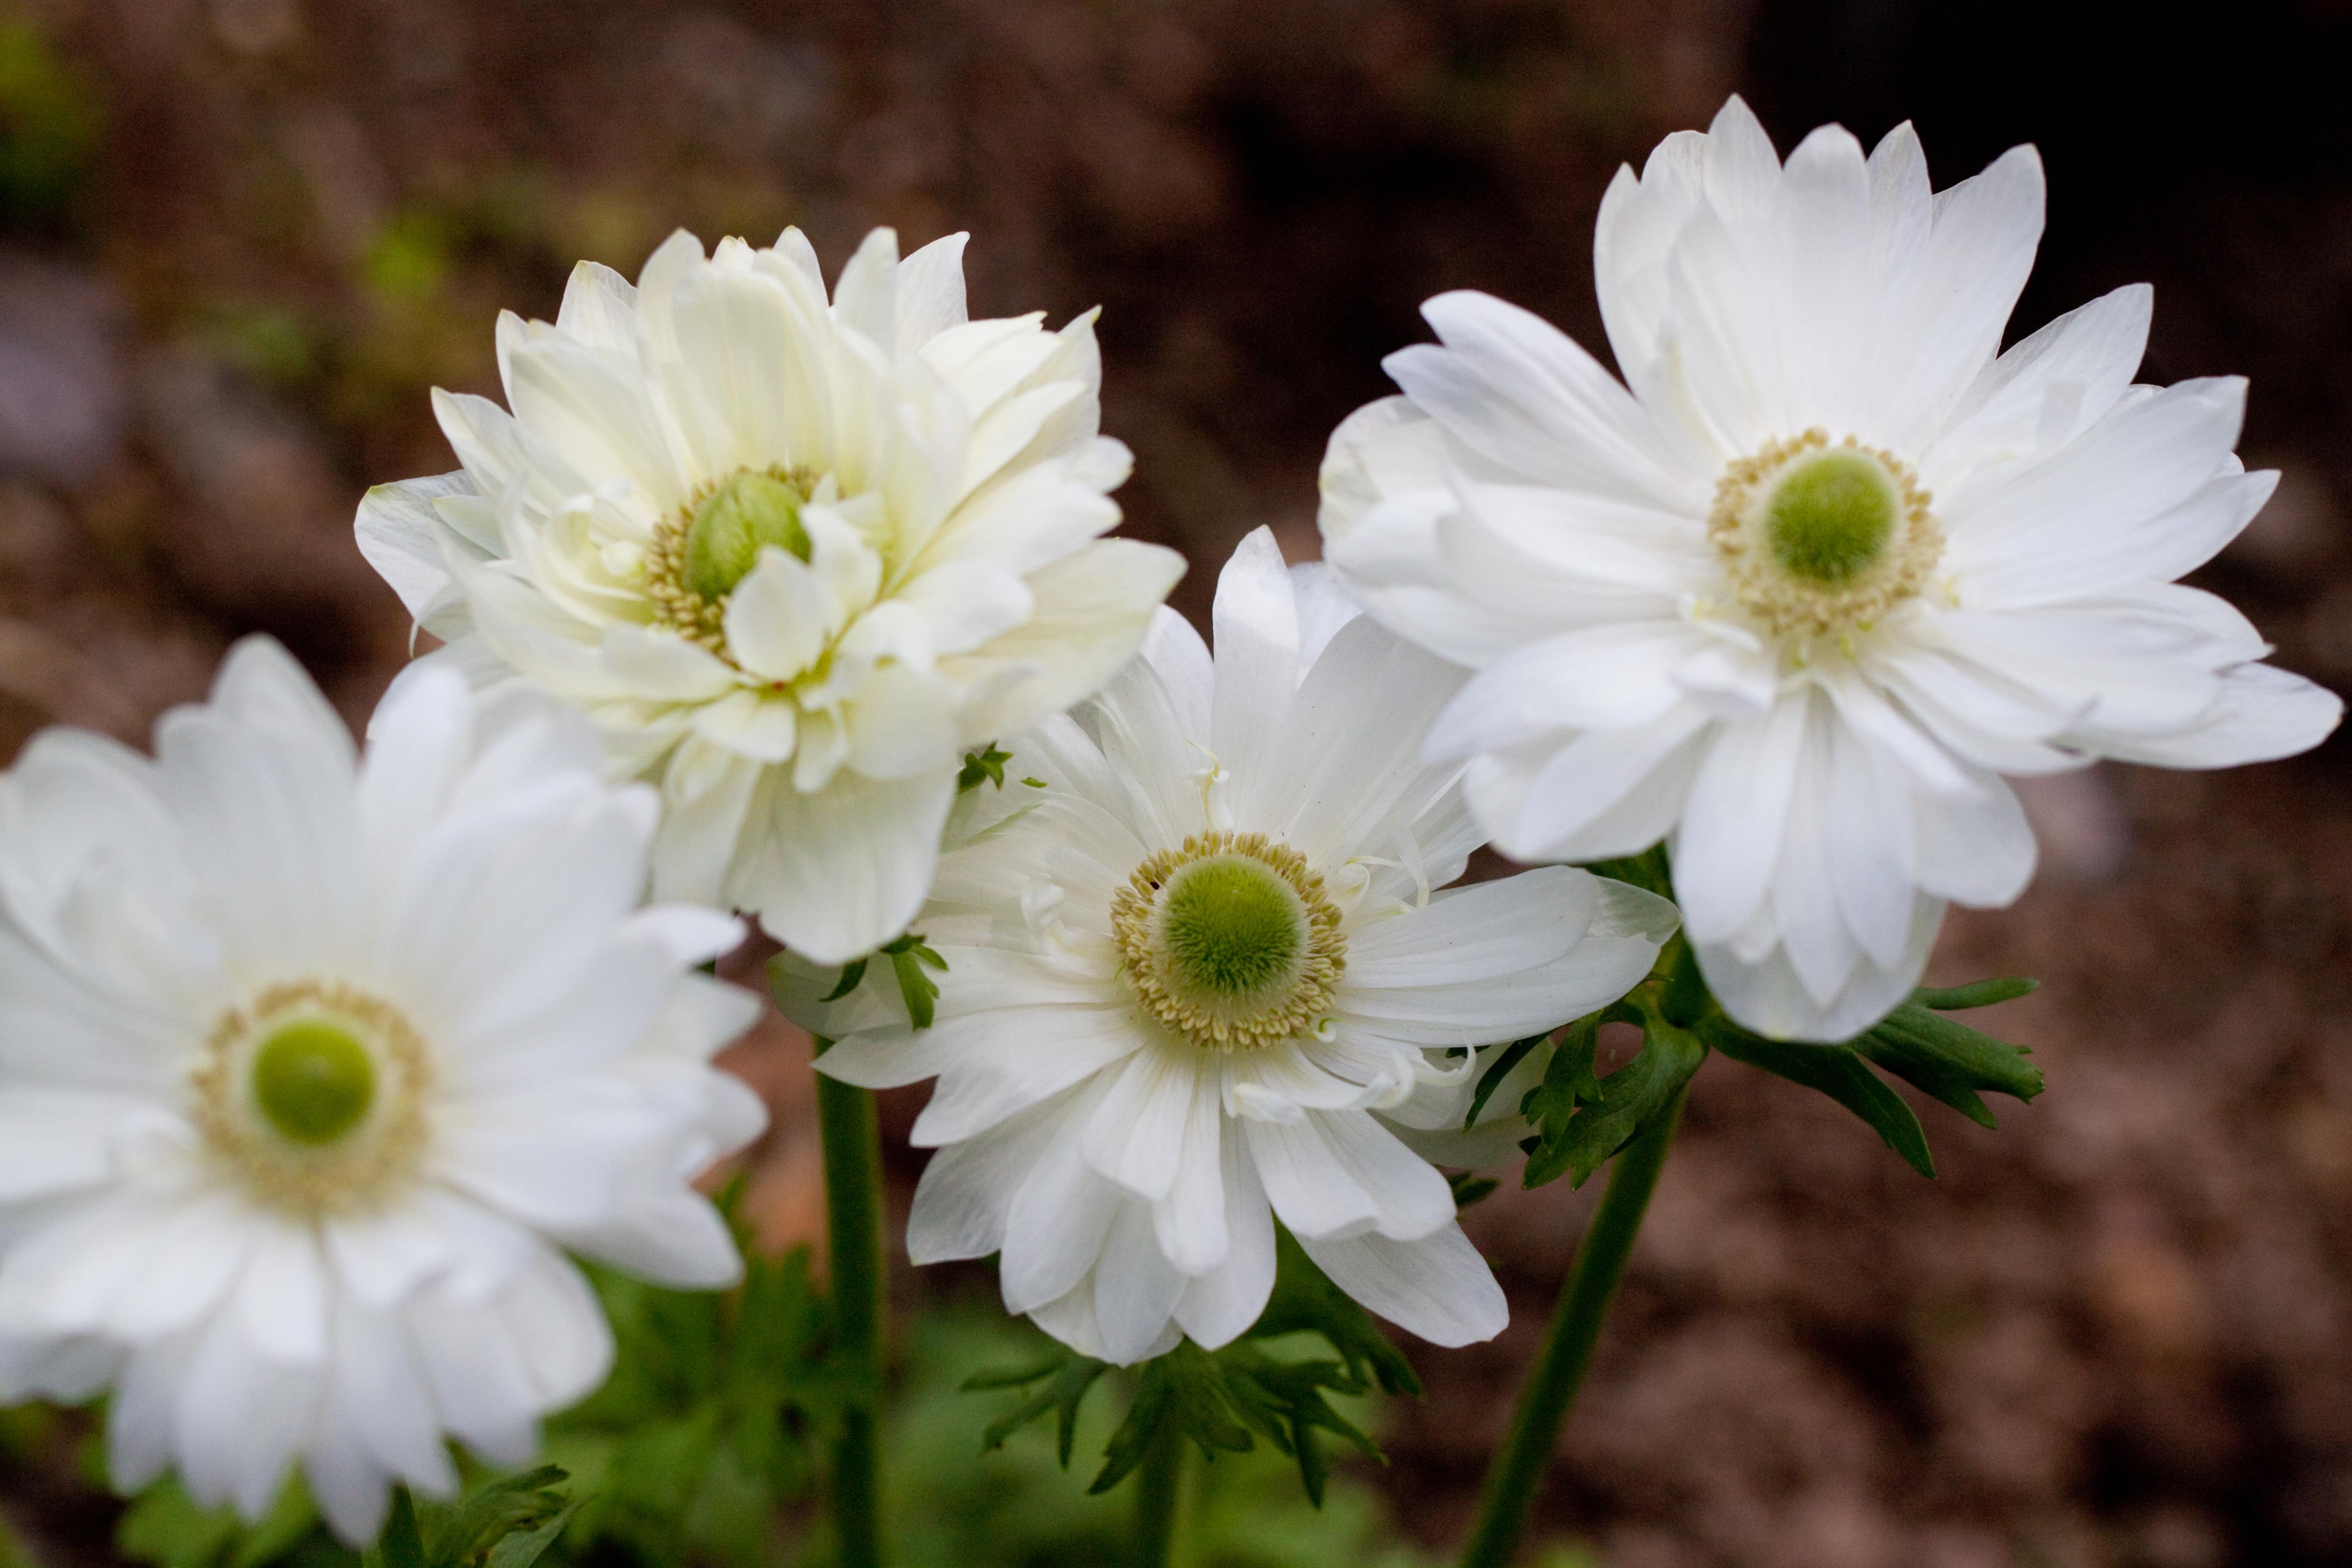 File Flower Anemone Flickr nekonomania Wikimedia mons